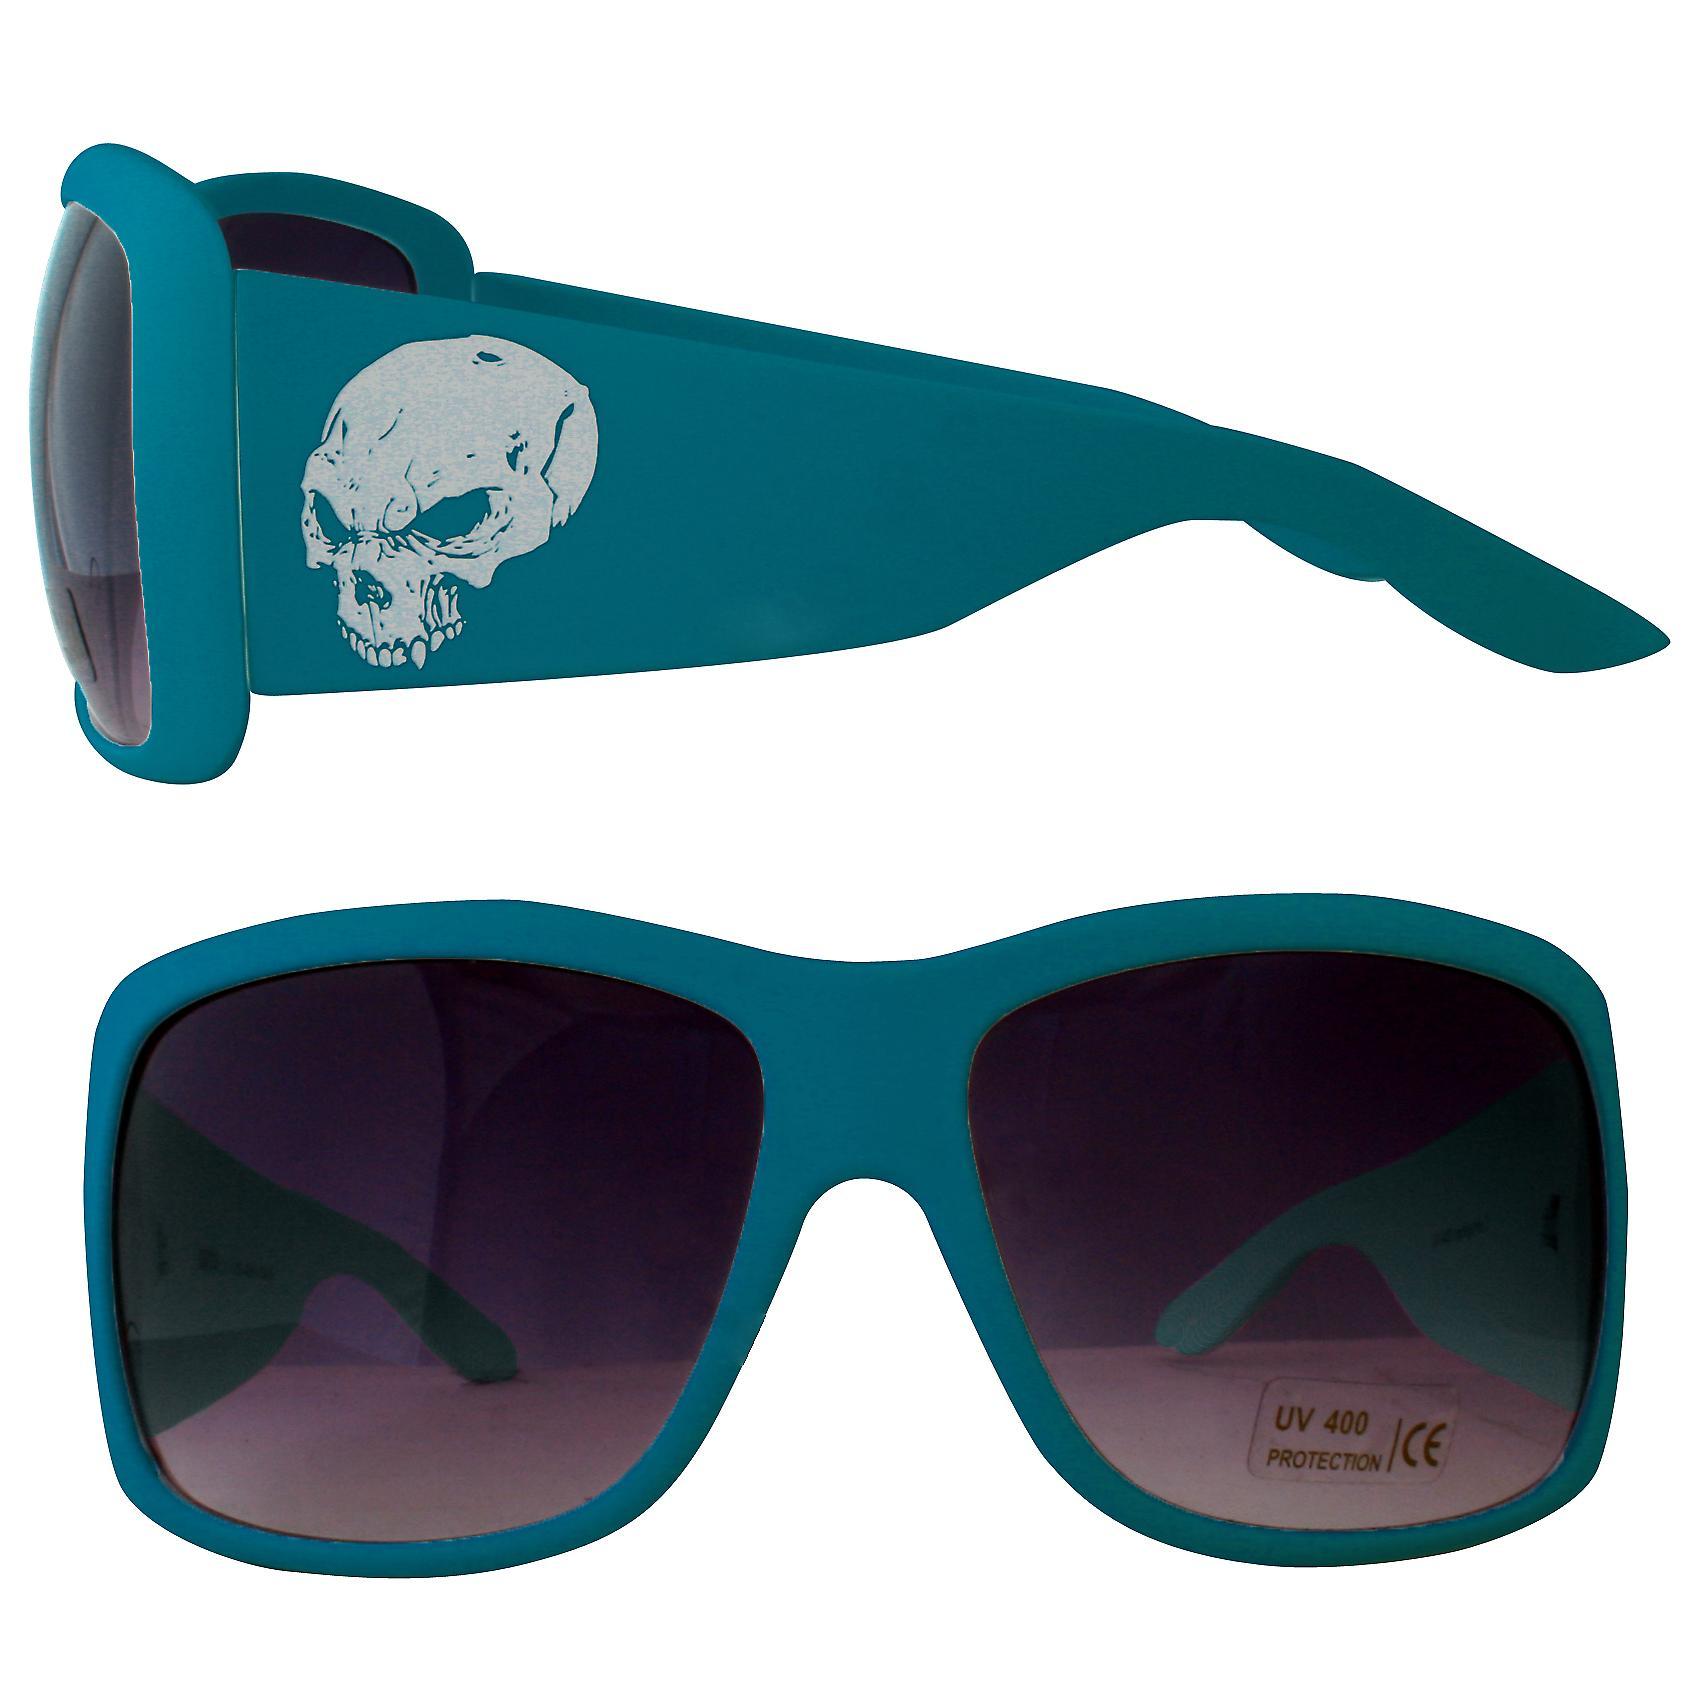 Waooh - solglasögon 910 - Design skalle Destroy - montera färg - UV400 skydd kategori 3 - solglasögon